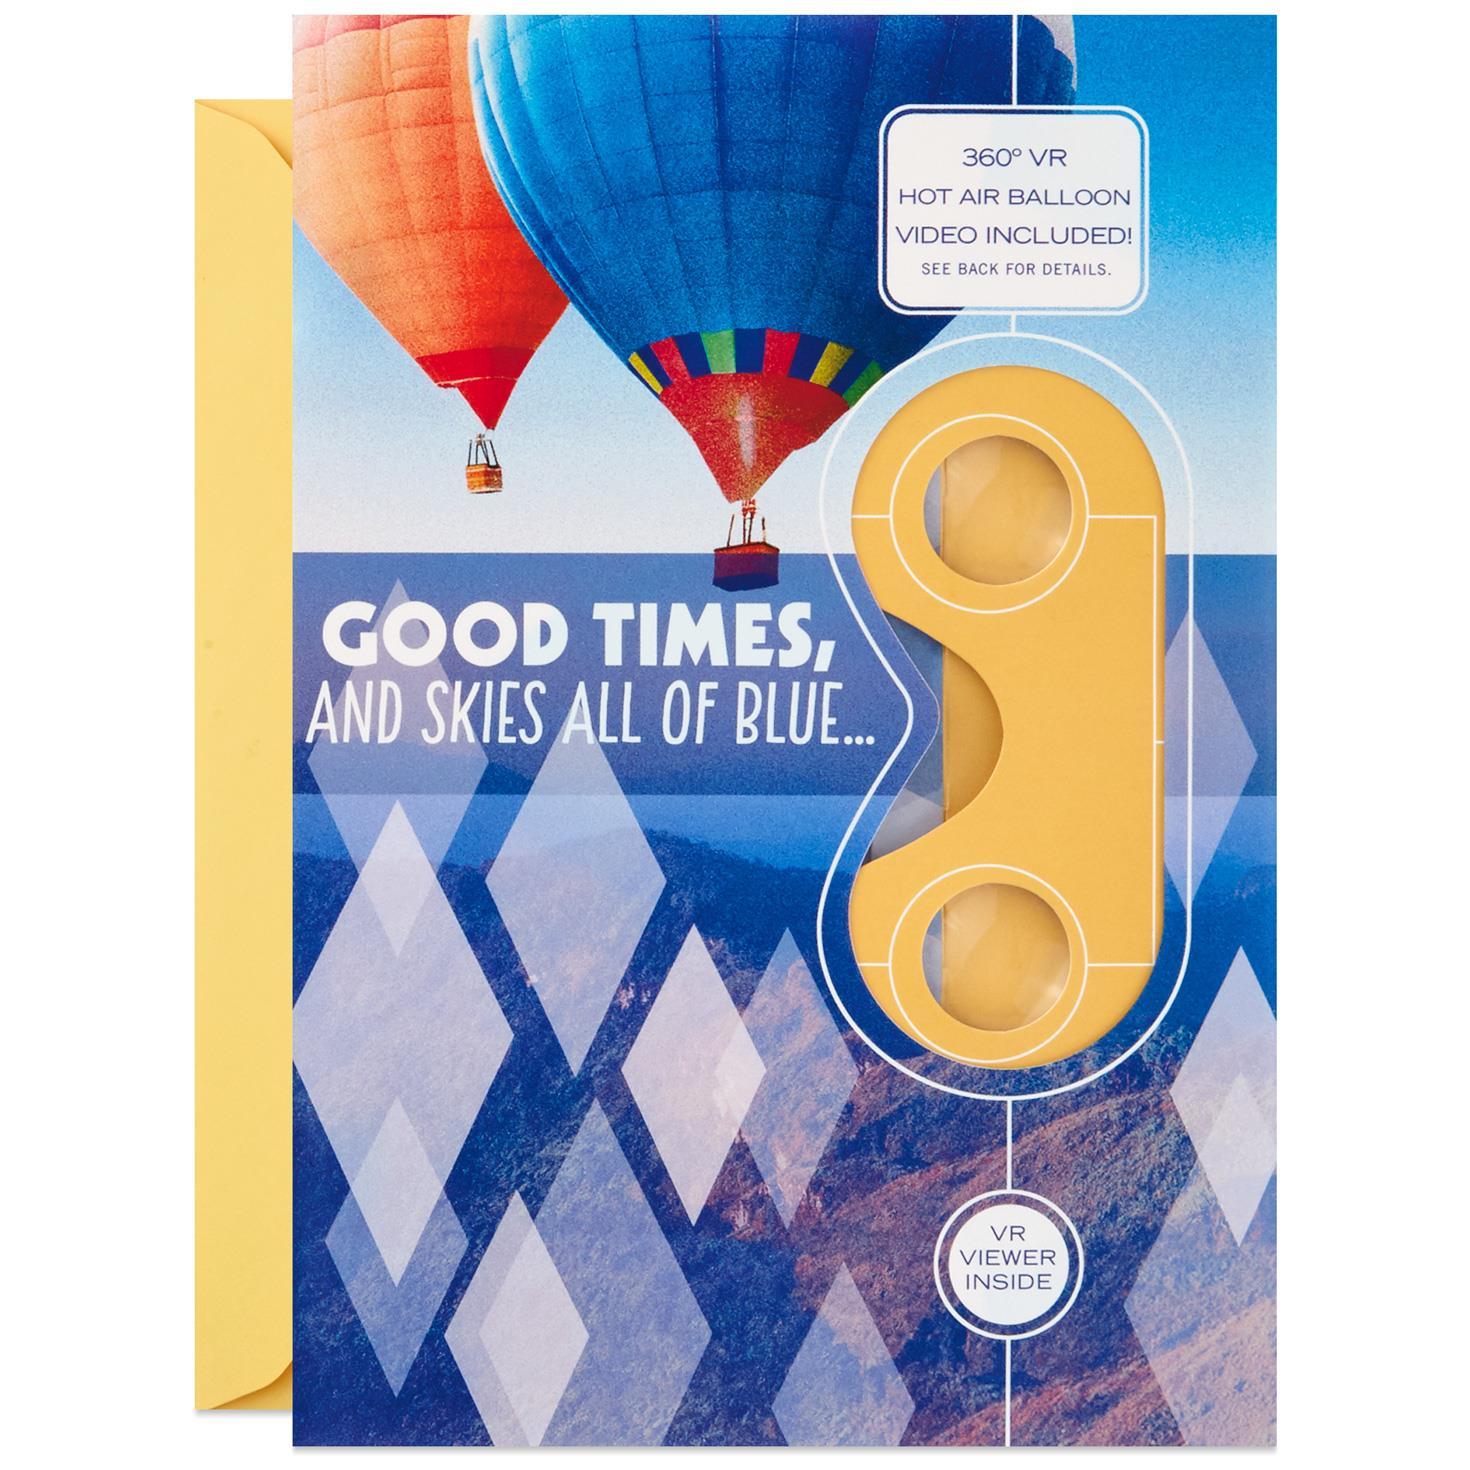 Good times and blue skies hot air balloon vr birthday card good times and blue skies hot air balloon vr birthday card bookmarktalkfo Image collections